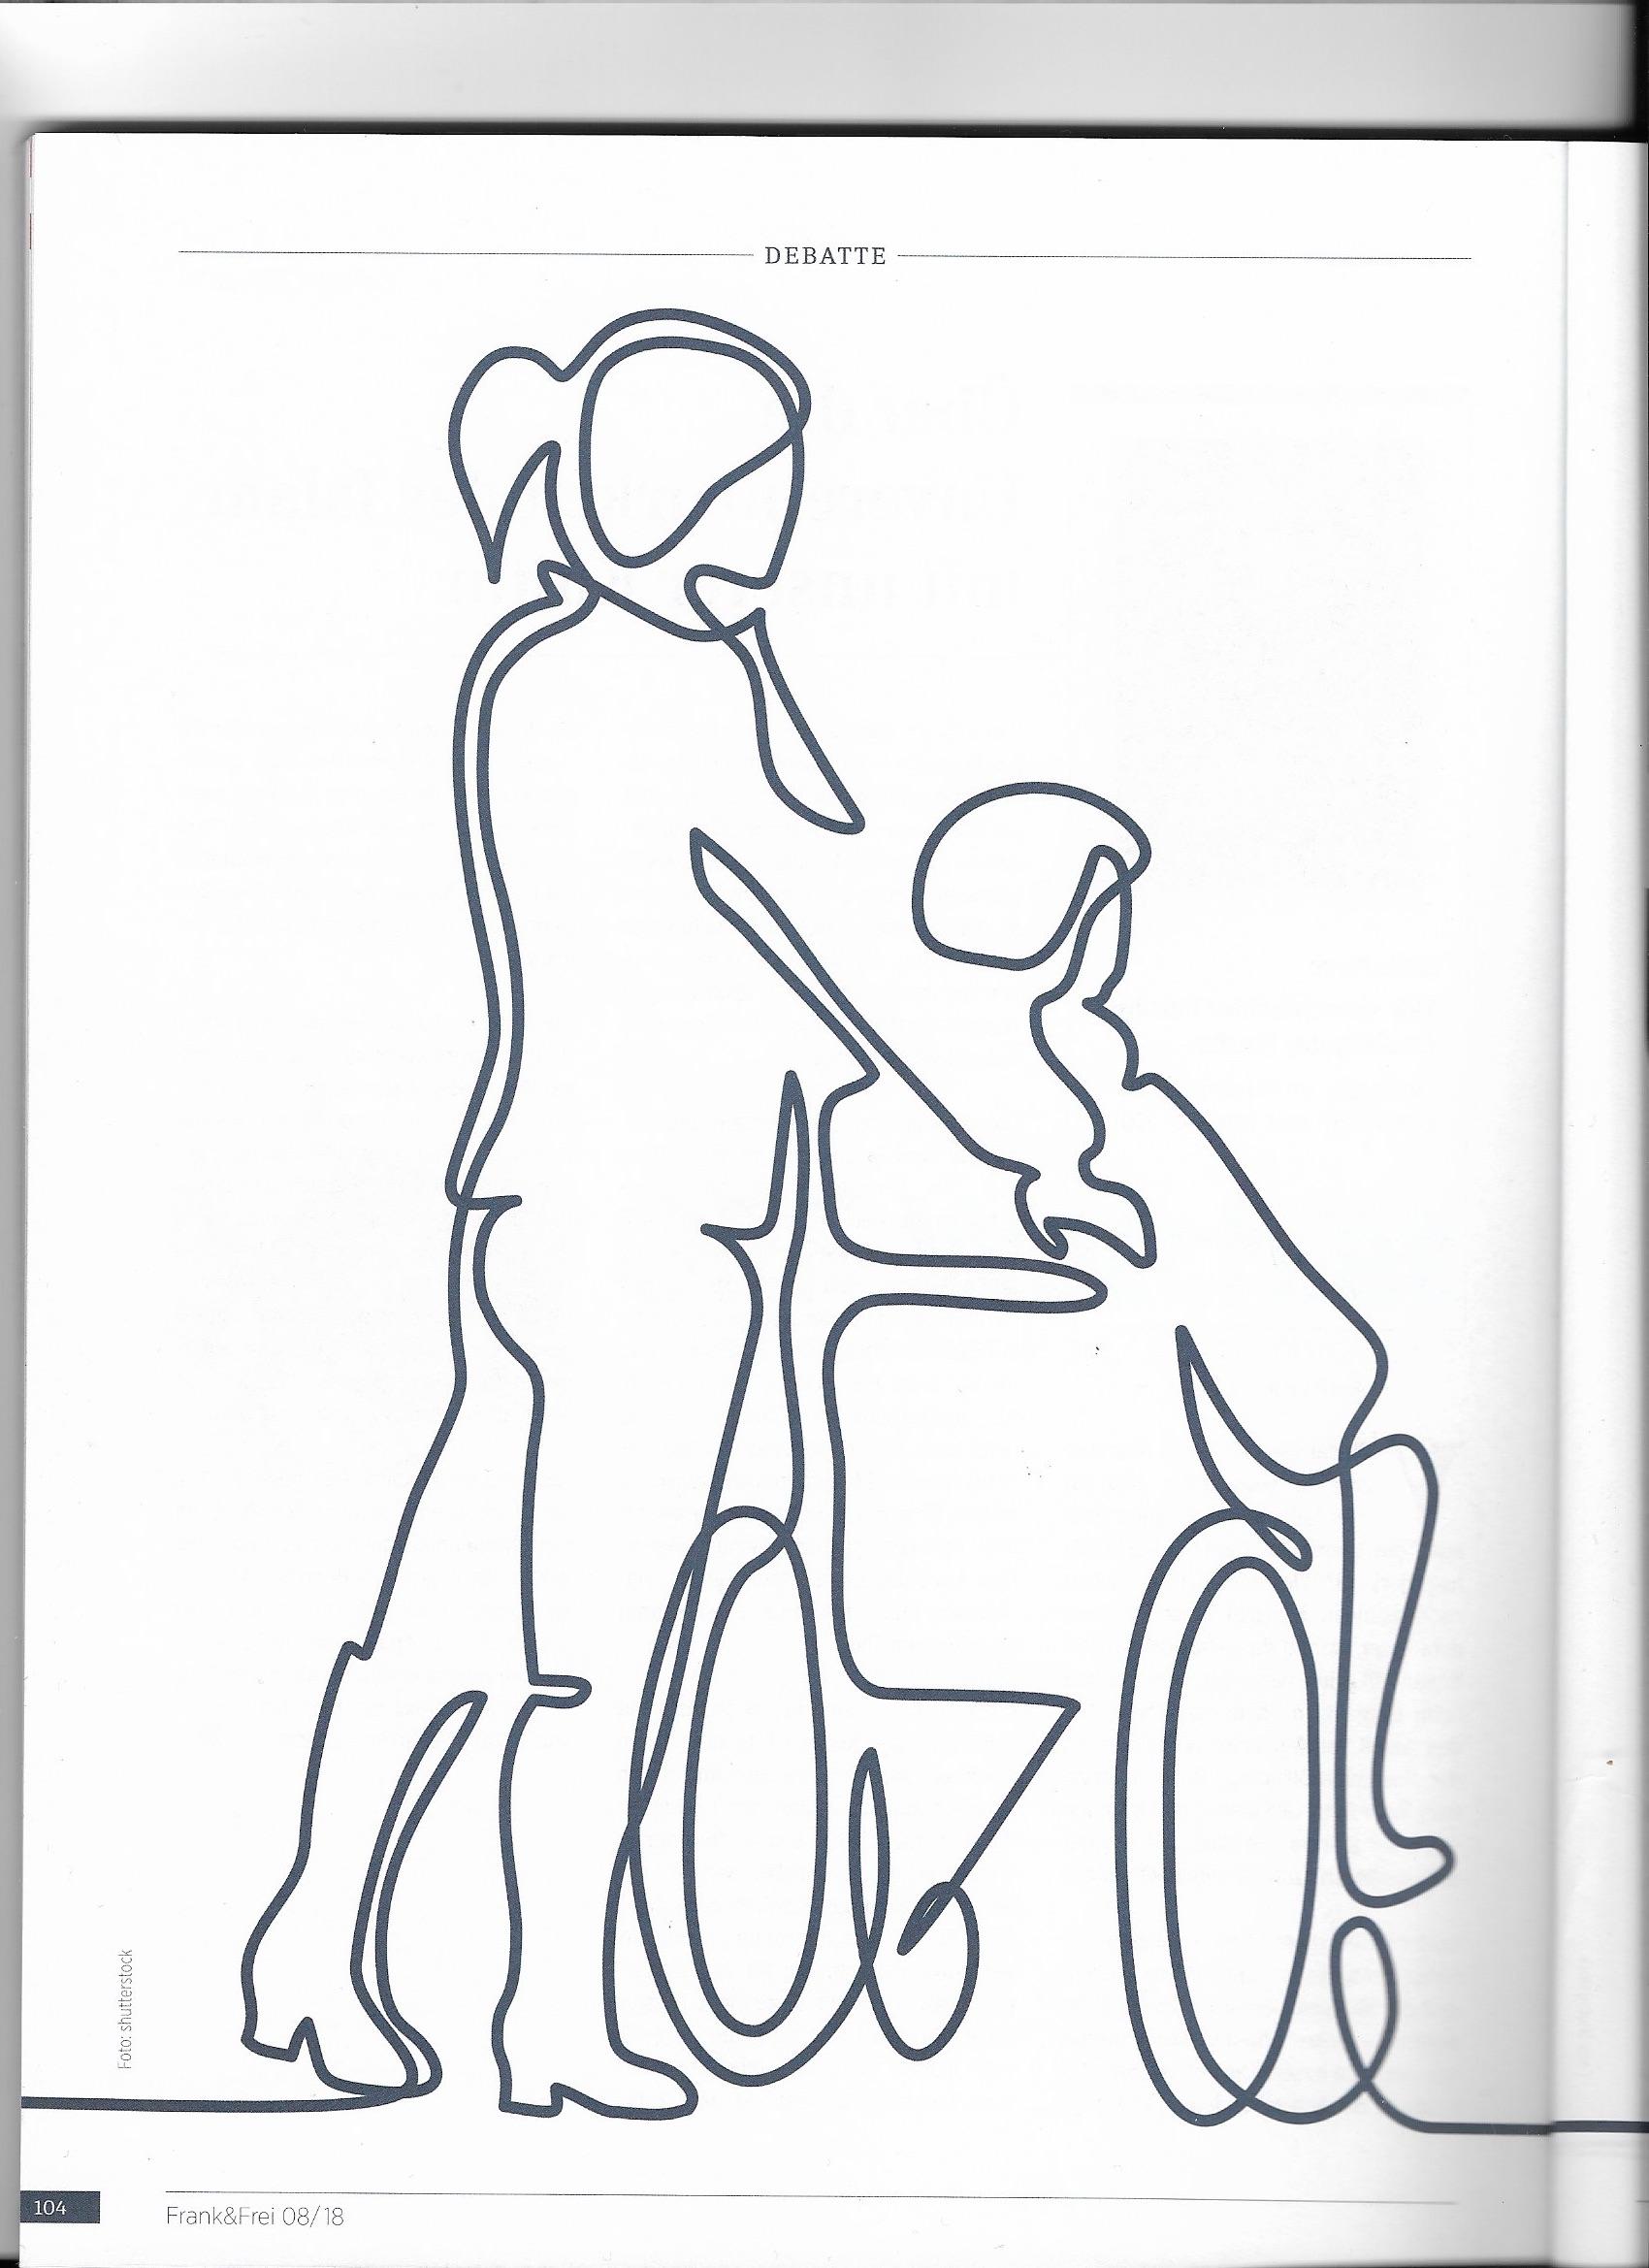 2018: Pflegedienst in Utopia